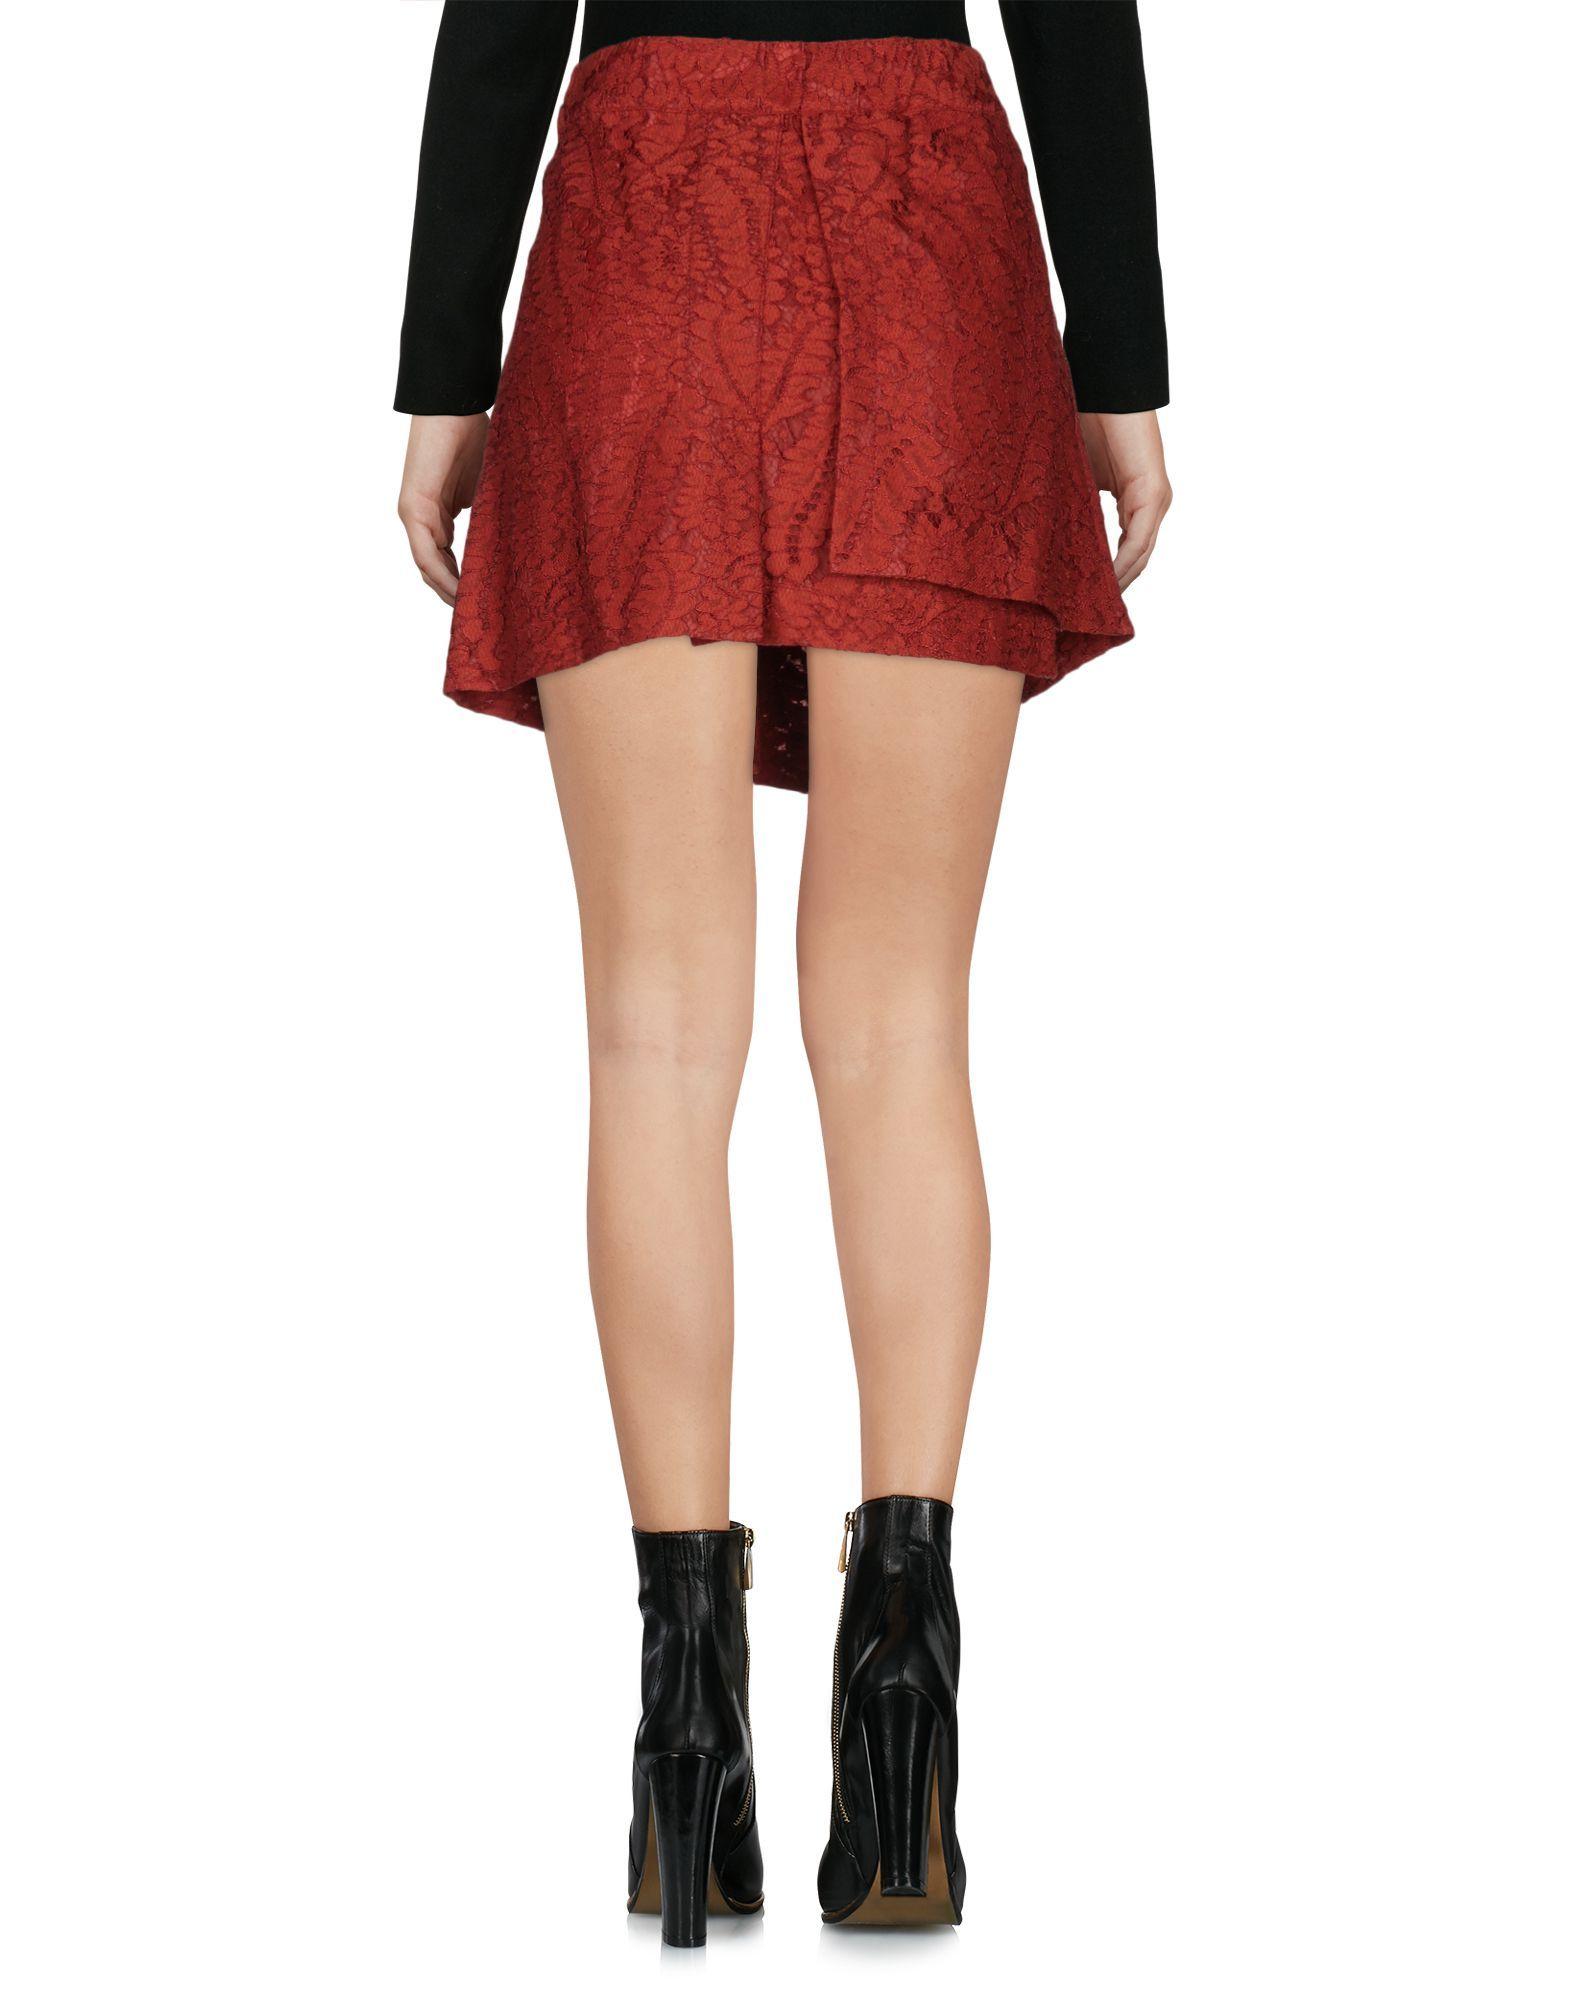 No21 Brick Red Cotton Skirt